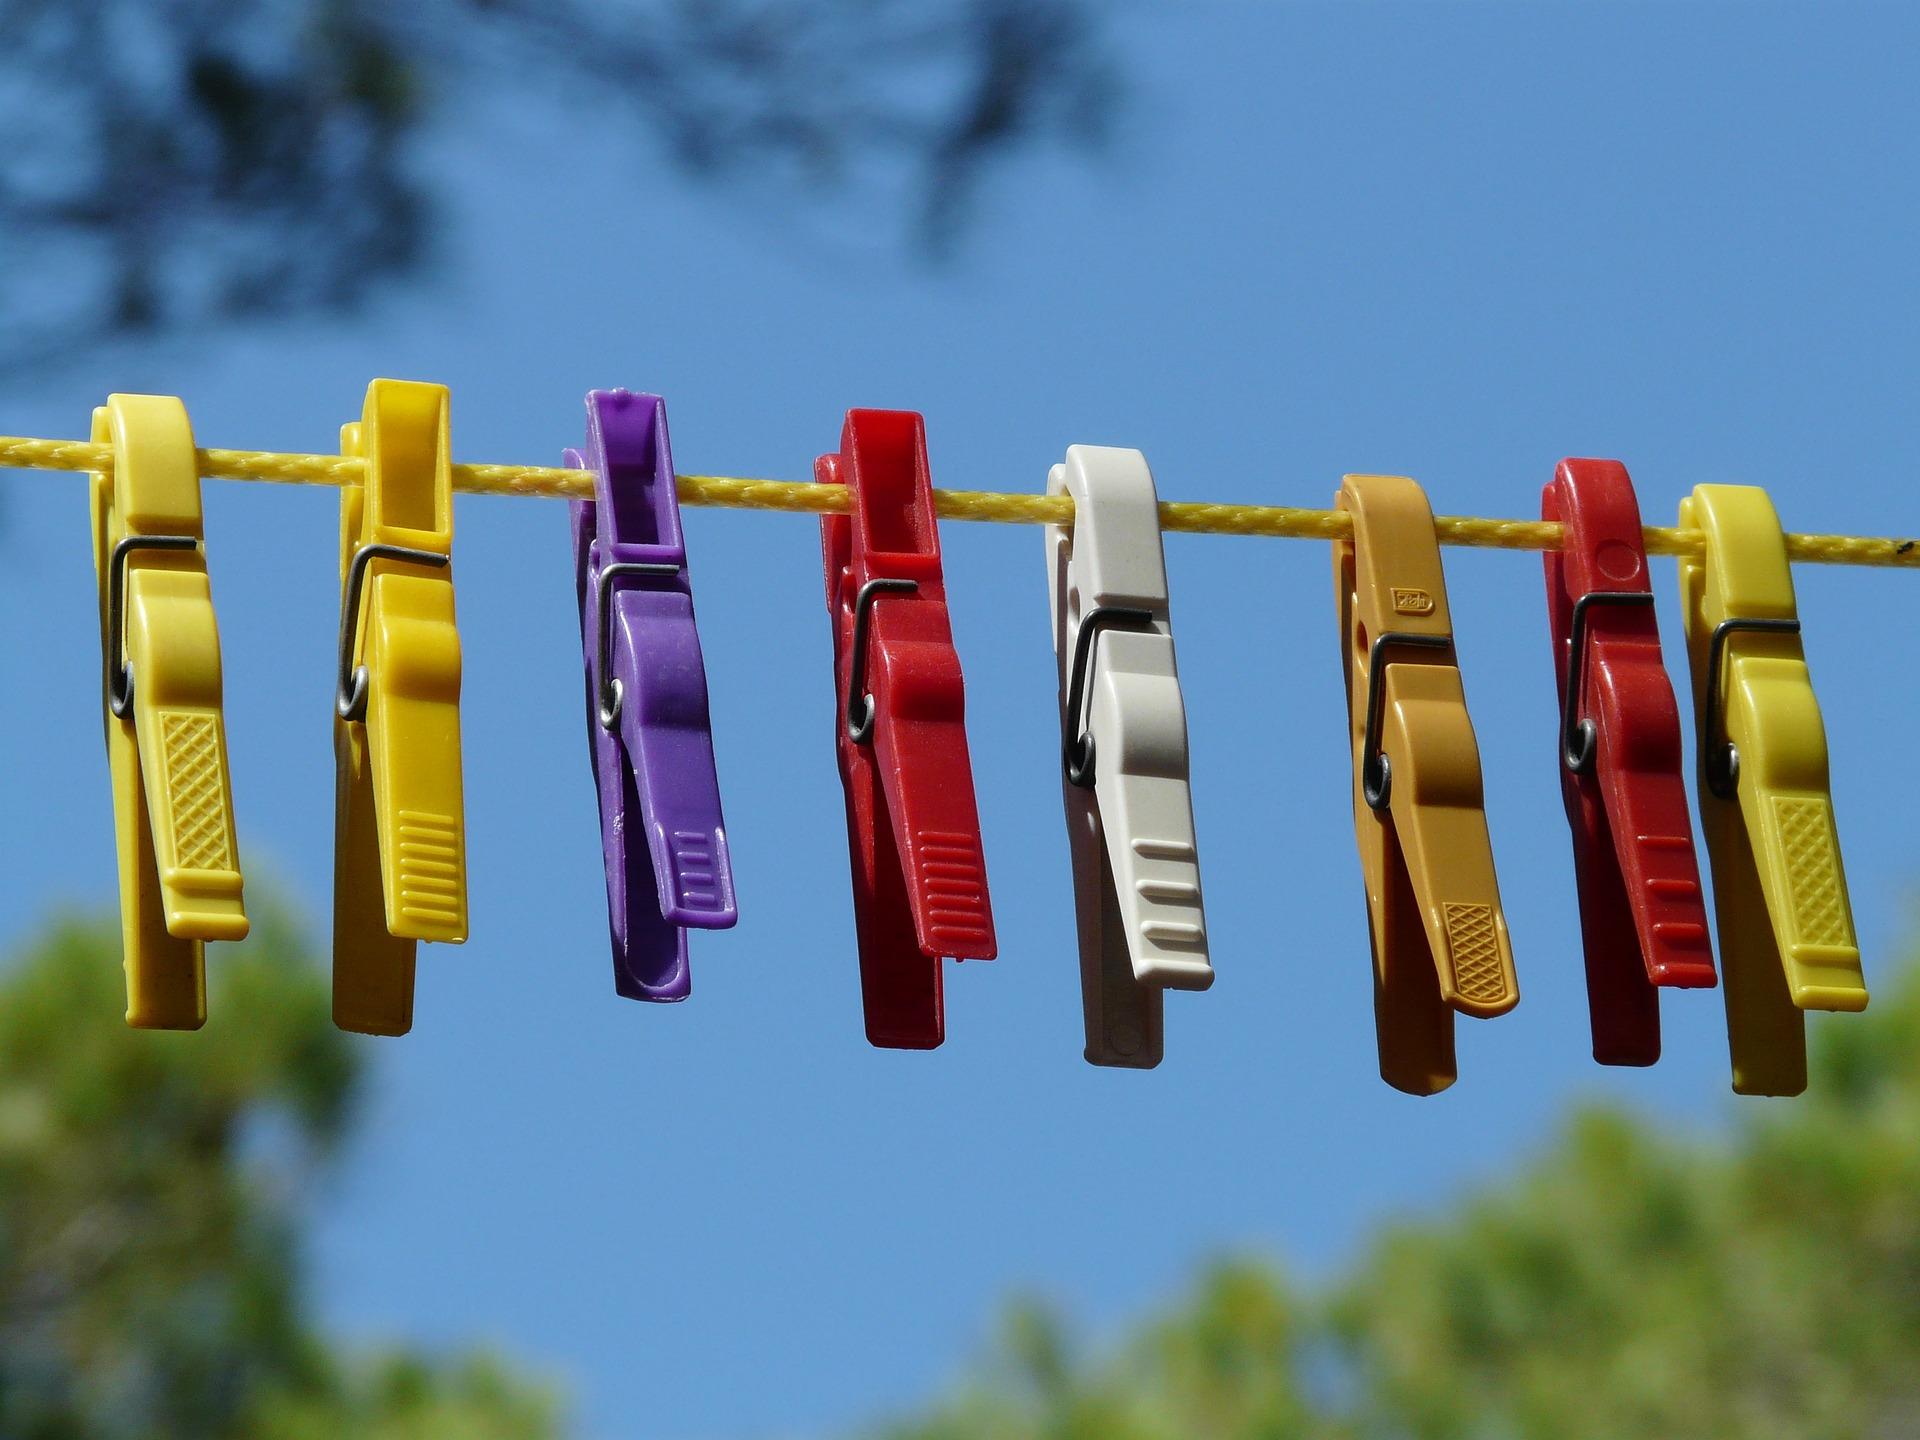 clothespins-9272_1920